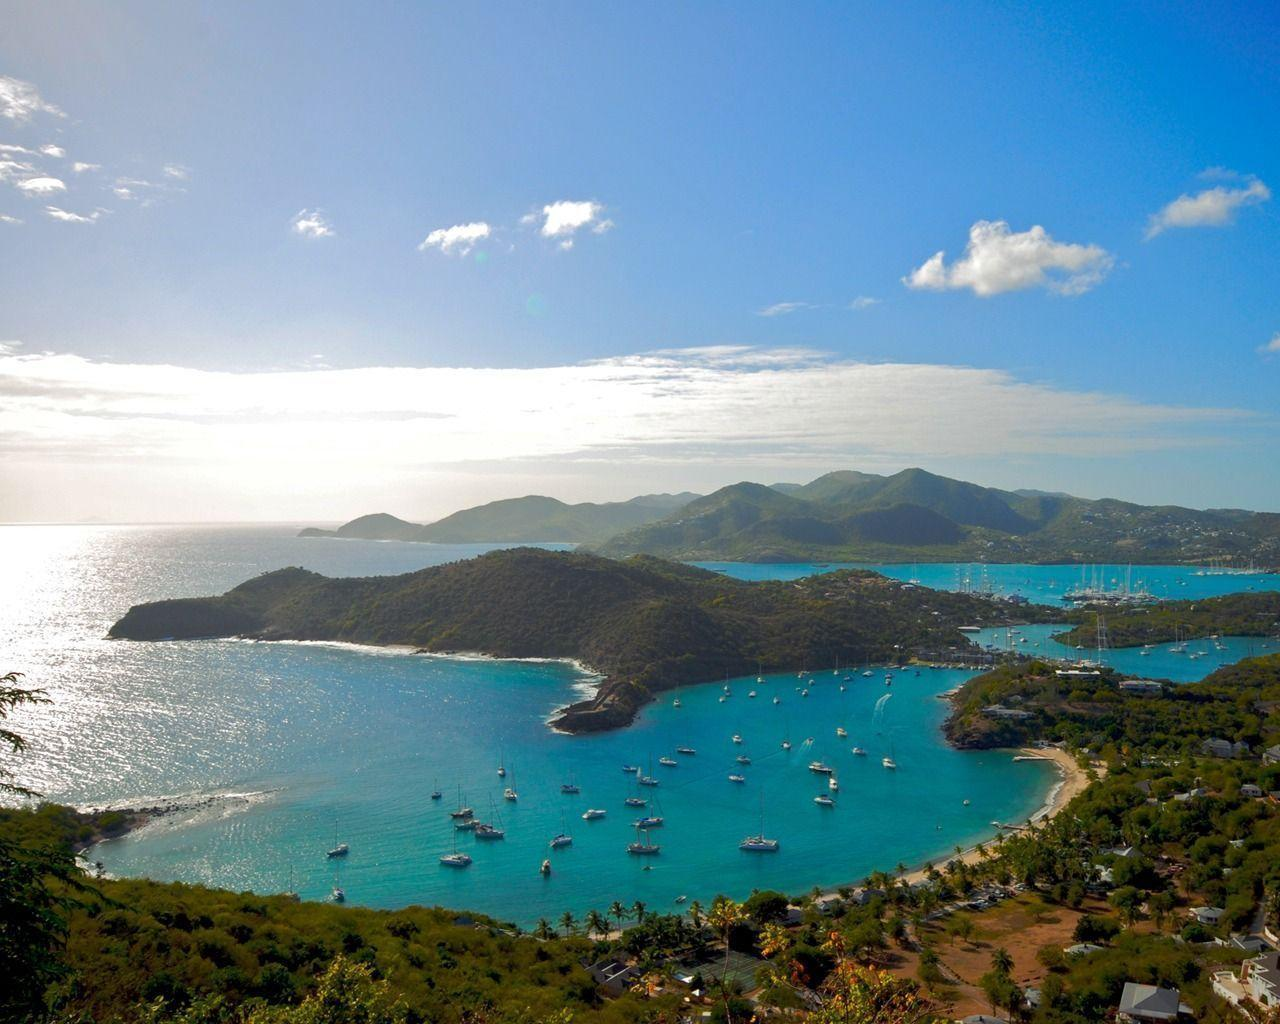 caribbean island postcard wallpaper - photo #8